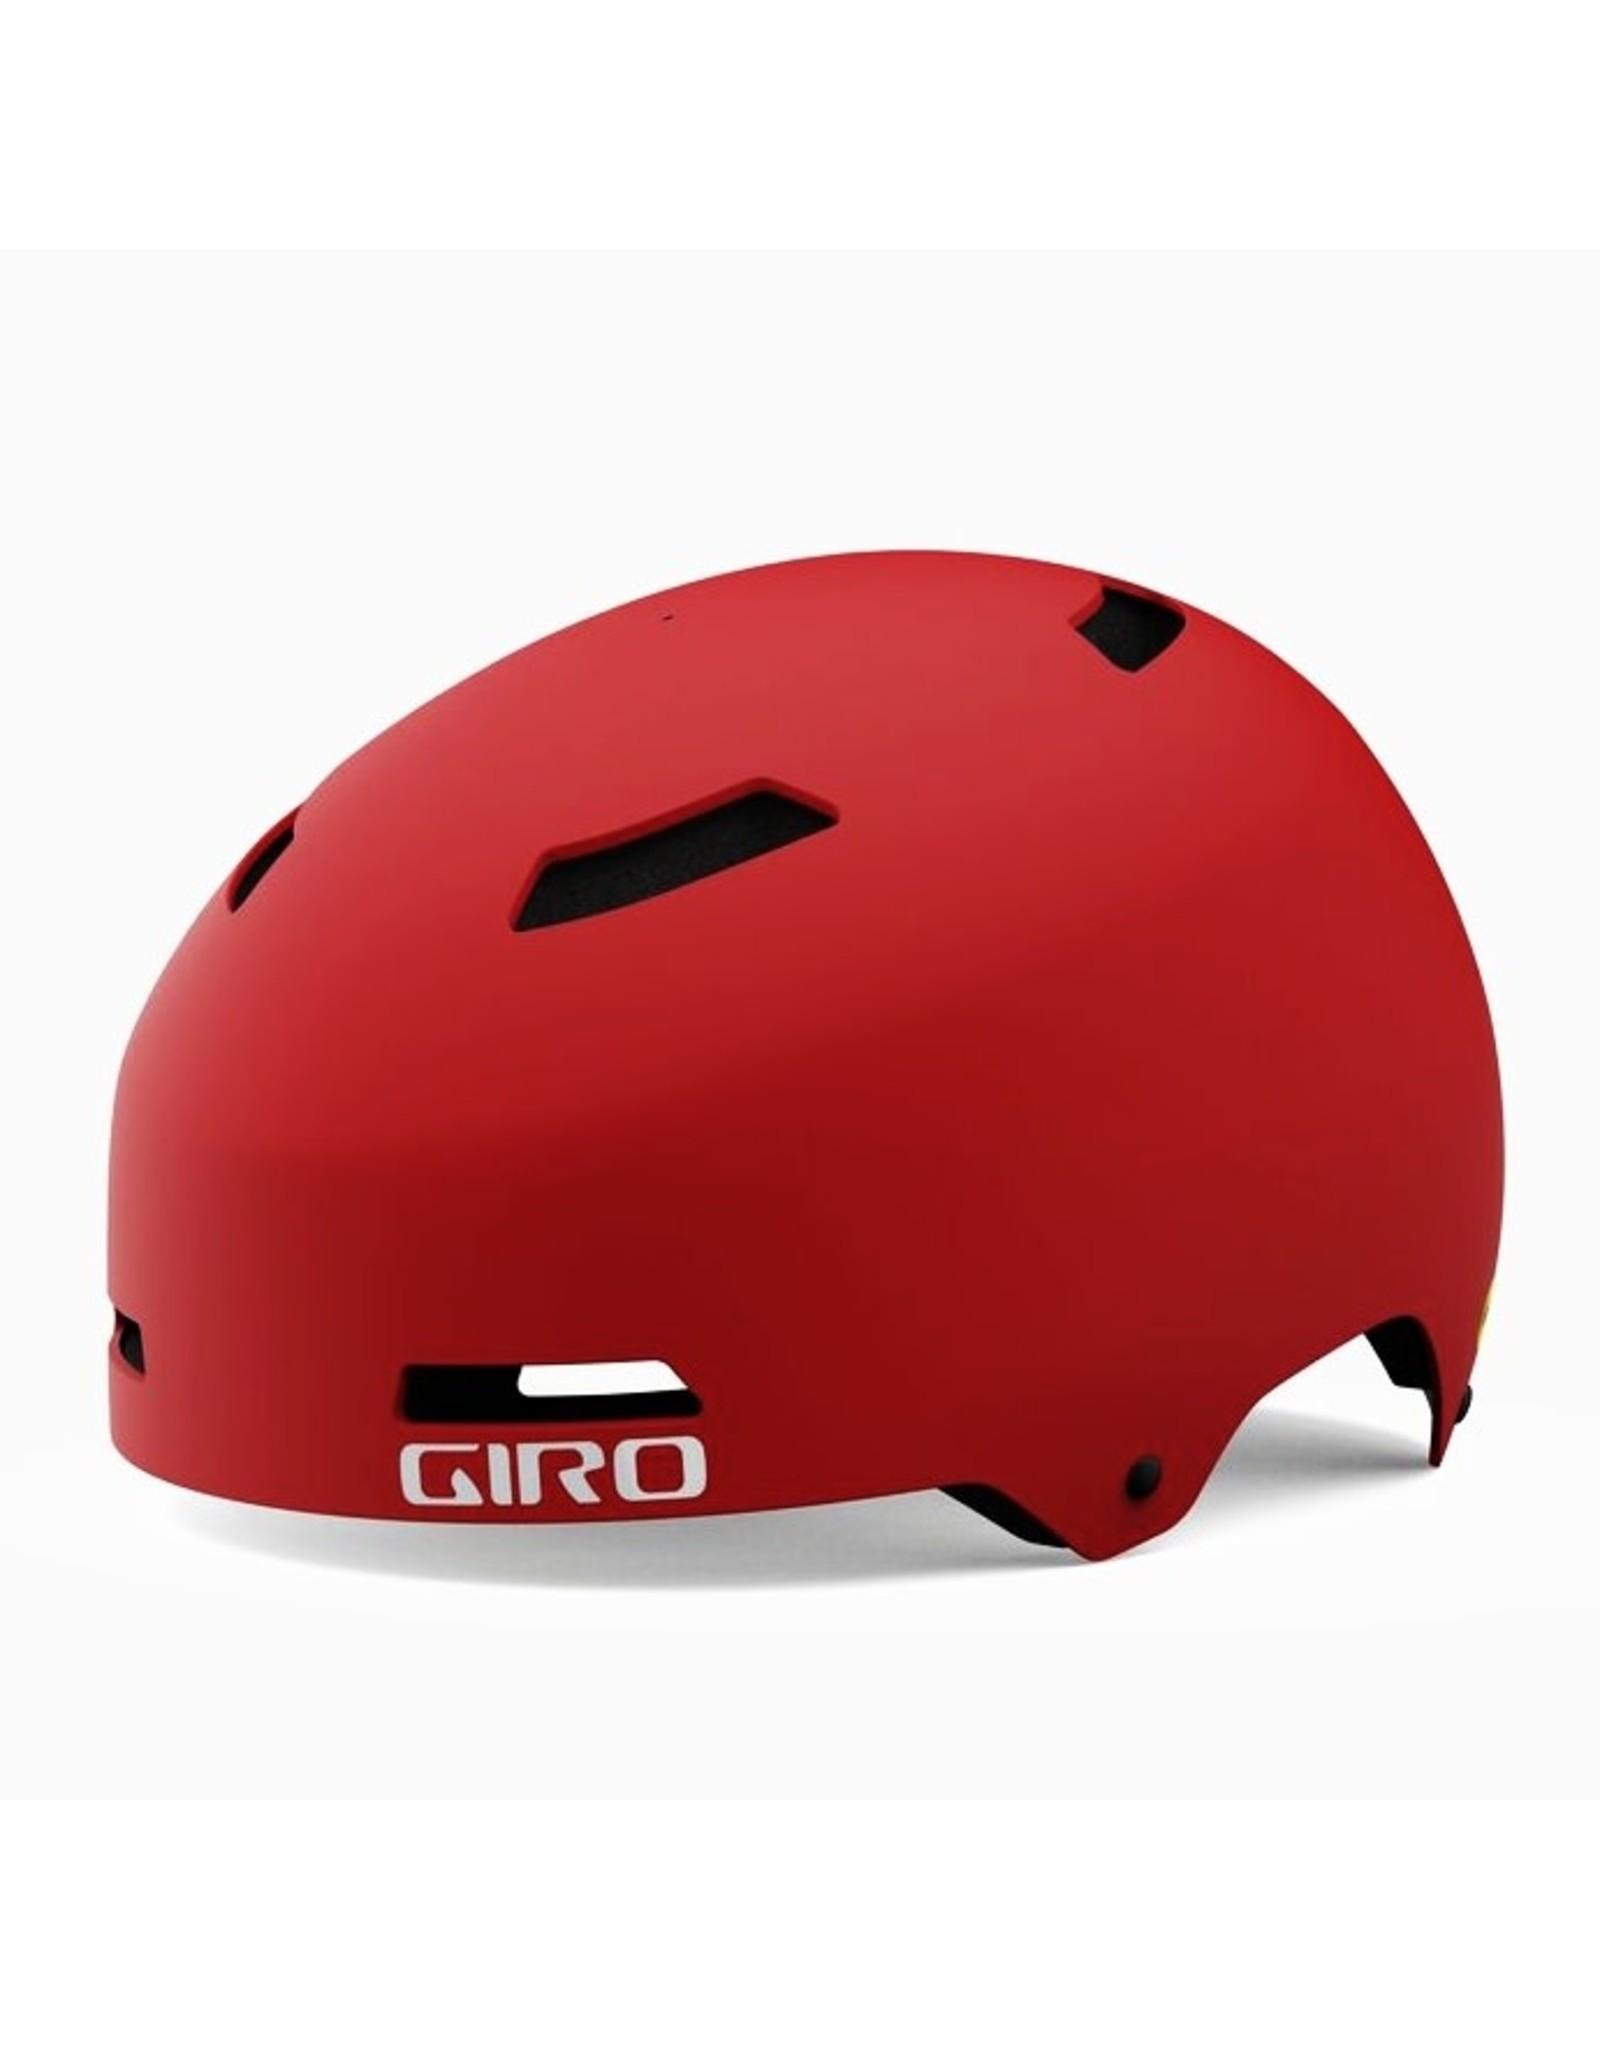 Giro GIRO QUARTER MAT TRIM RED BIKE HELMET